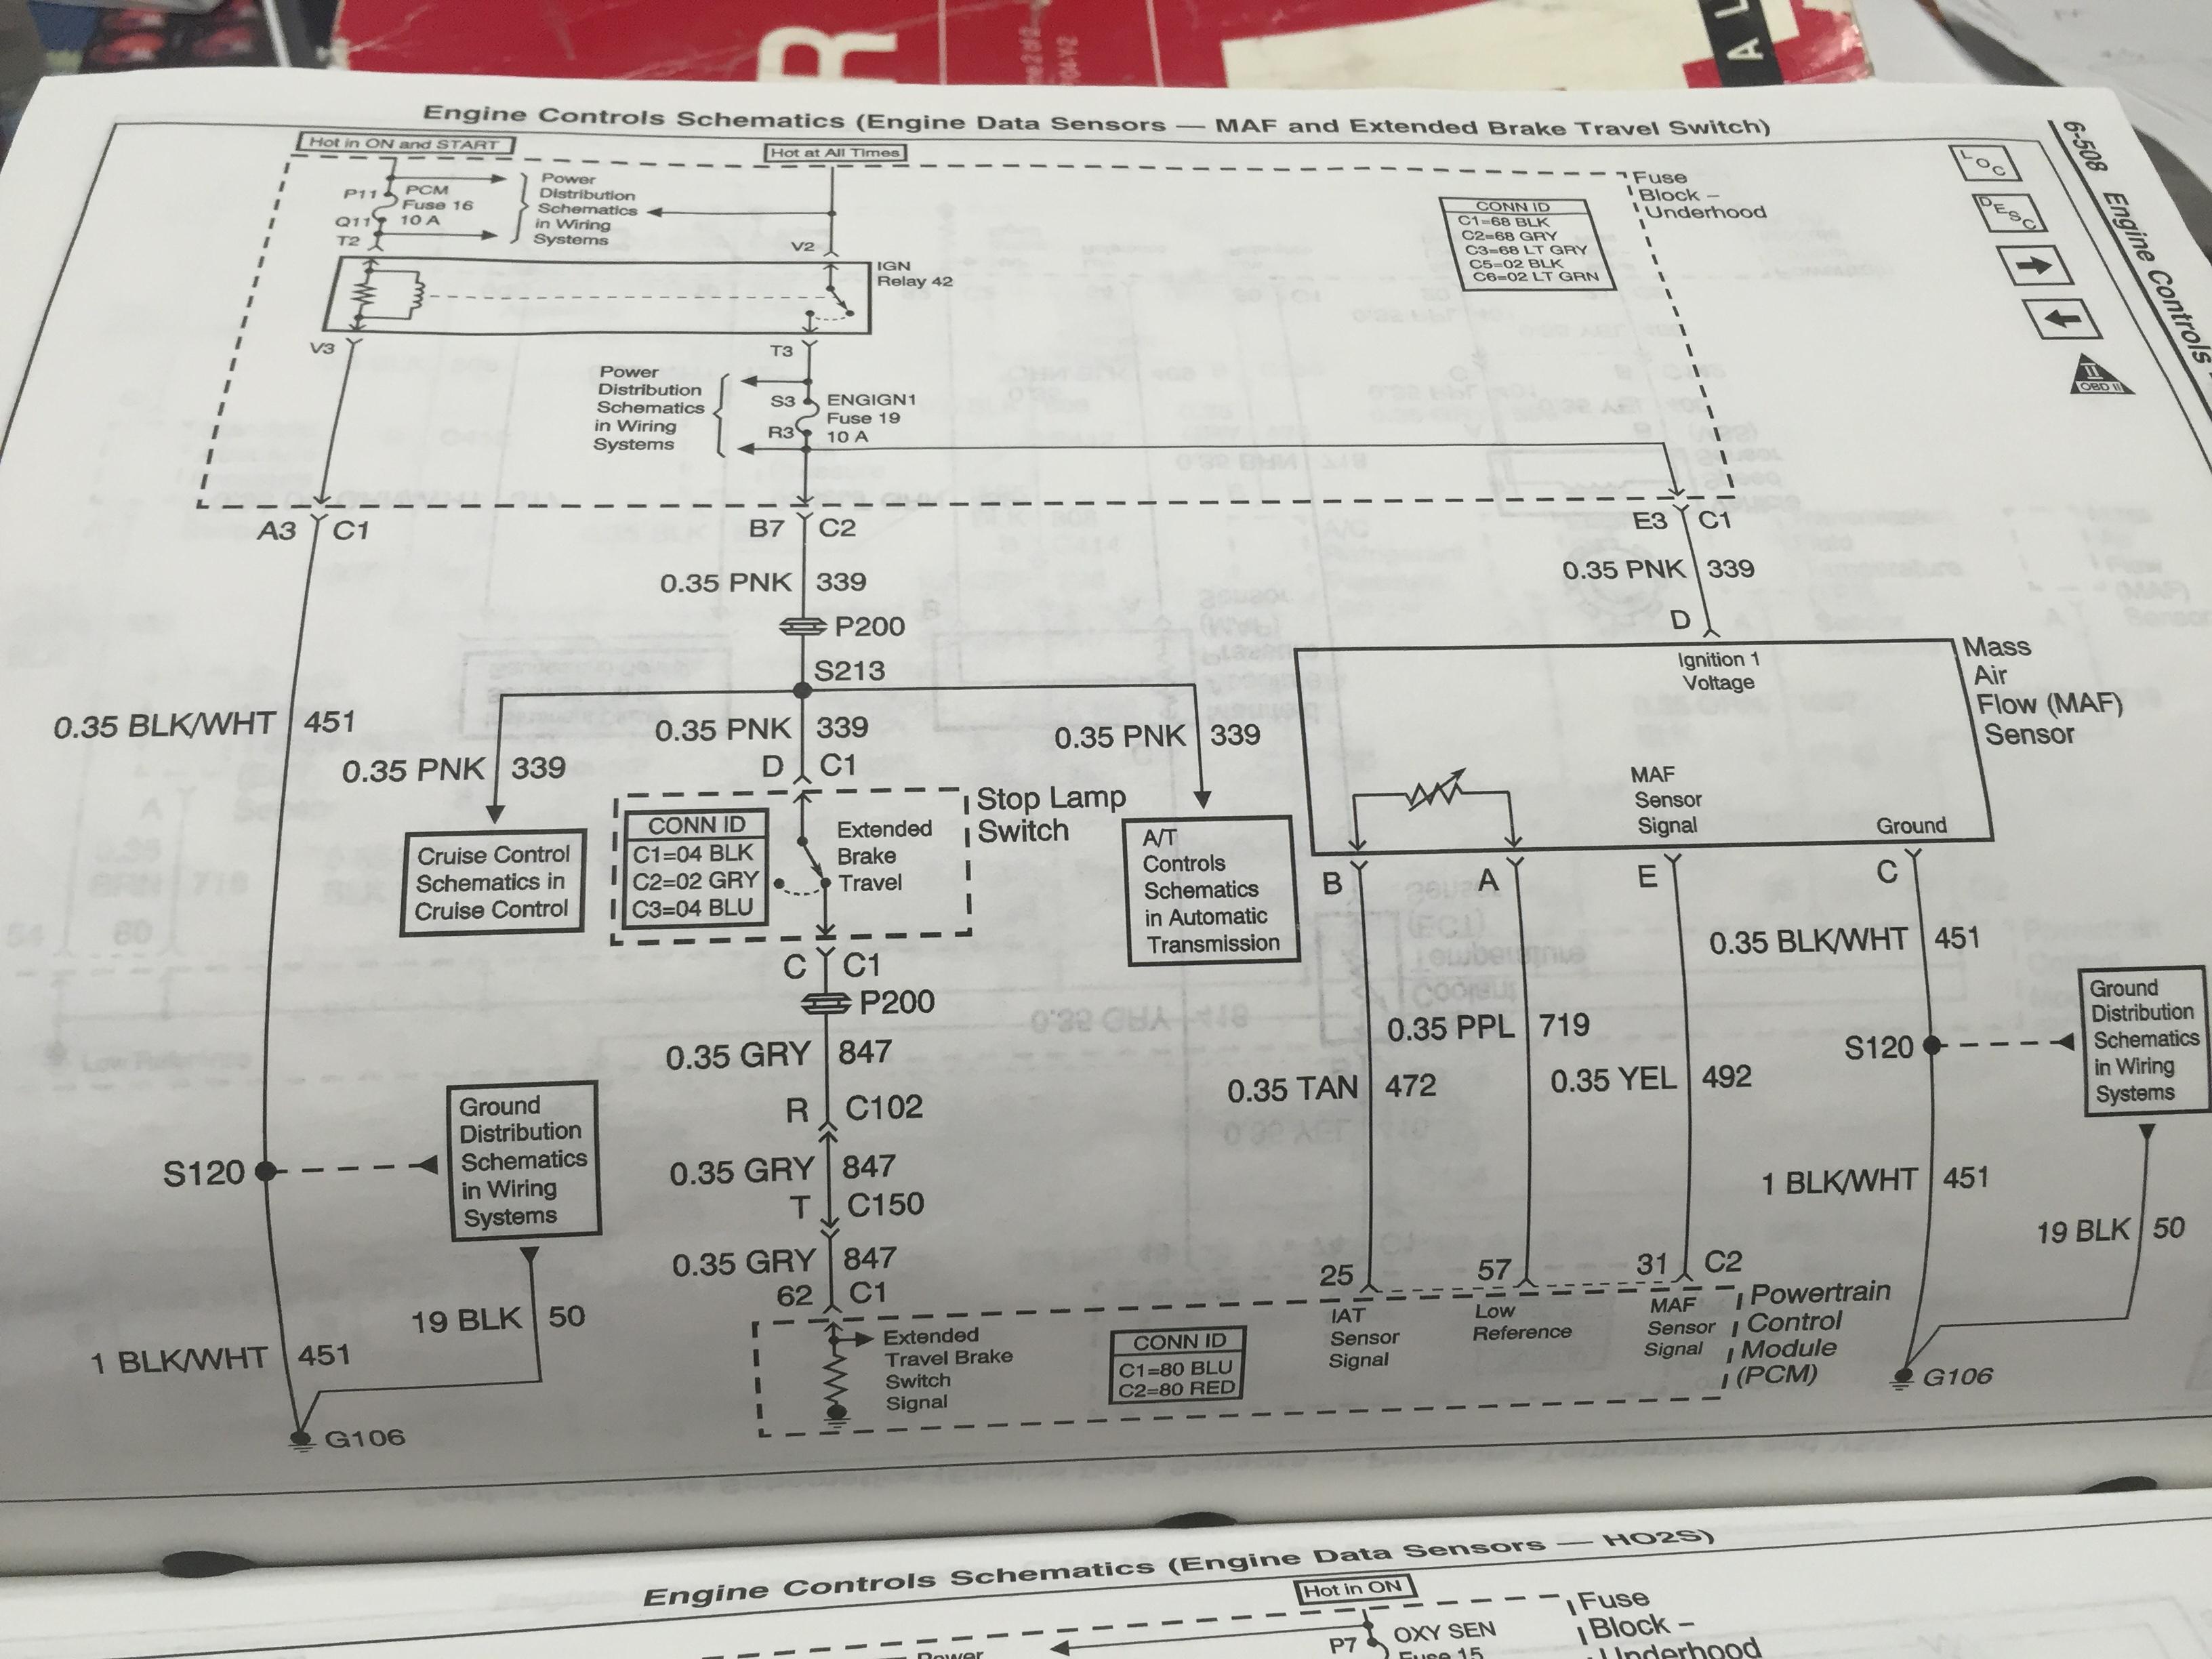 Wiring Diagram 8 1 Gm Mas Air Flow - All Wiring Diagram Data - Mass Air Flow Wiring Diagram